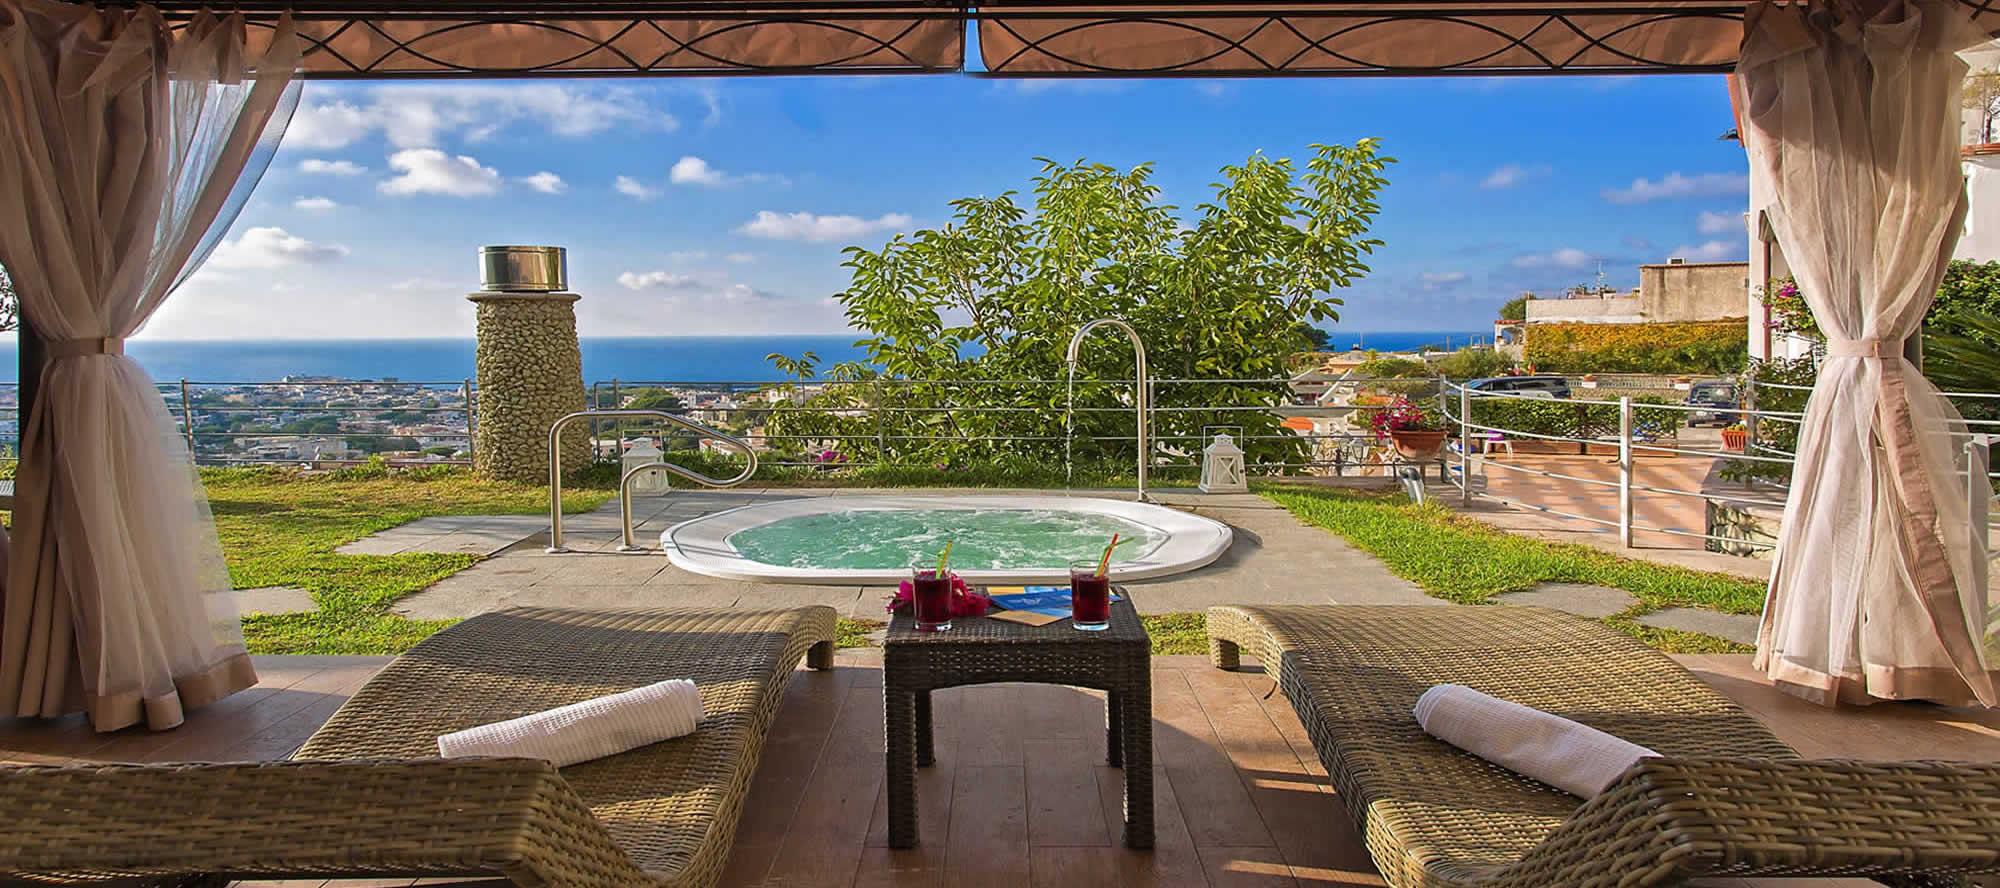 Hotel Ischia a Forio - Hotel Residence La Rosa